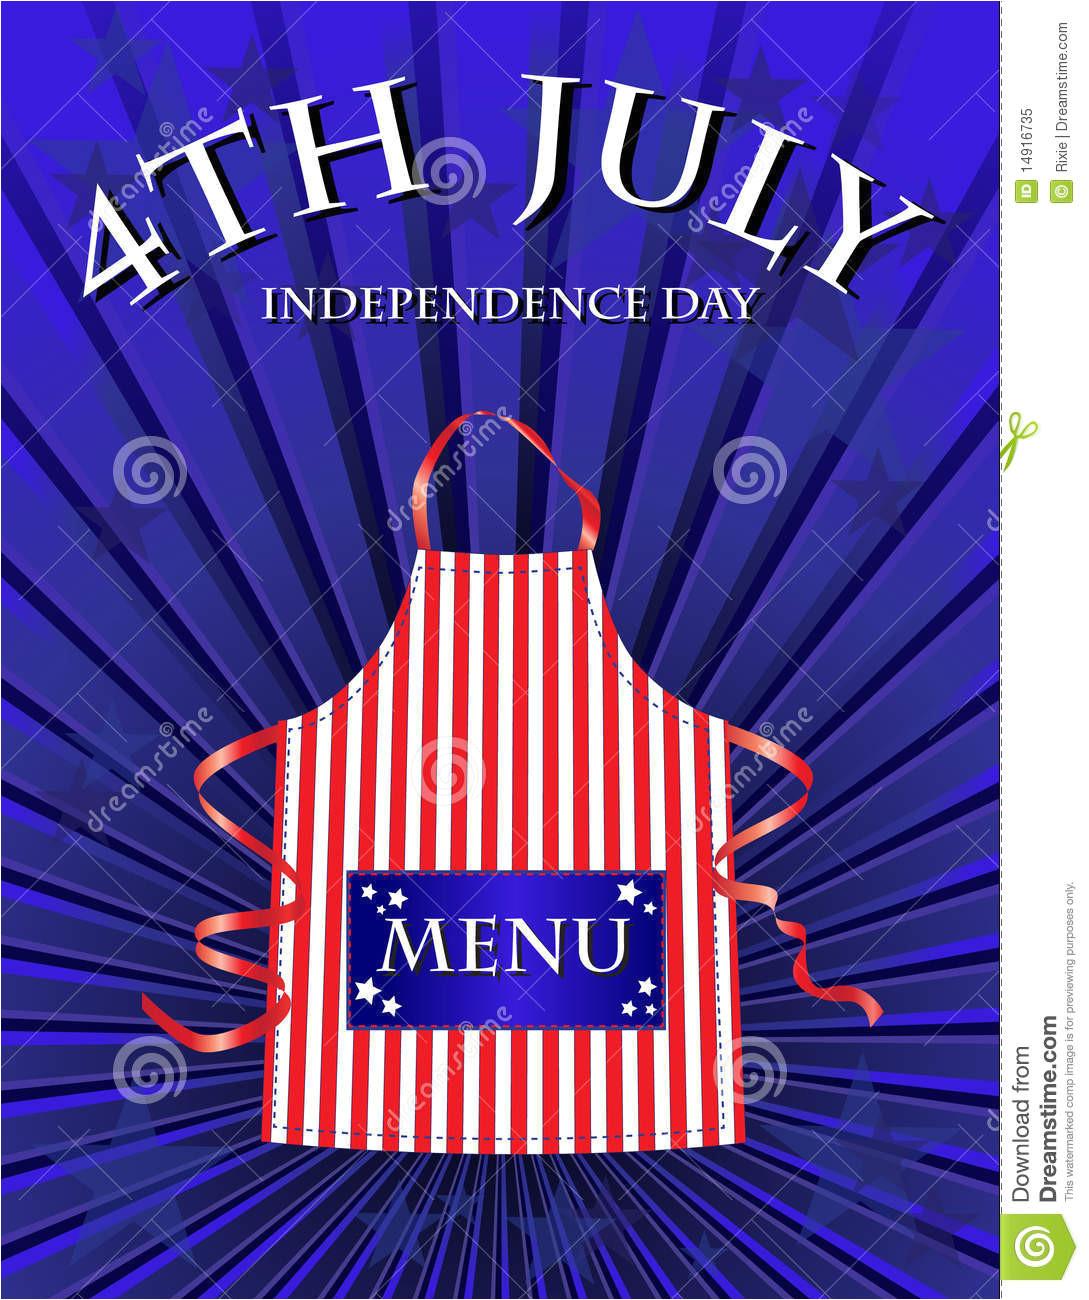 royalty free stock photo 4th july menu image14916735